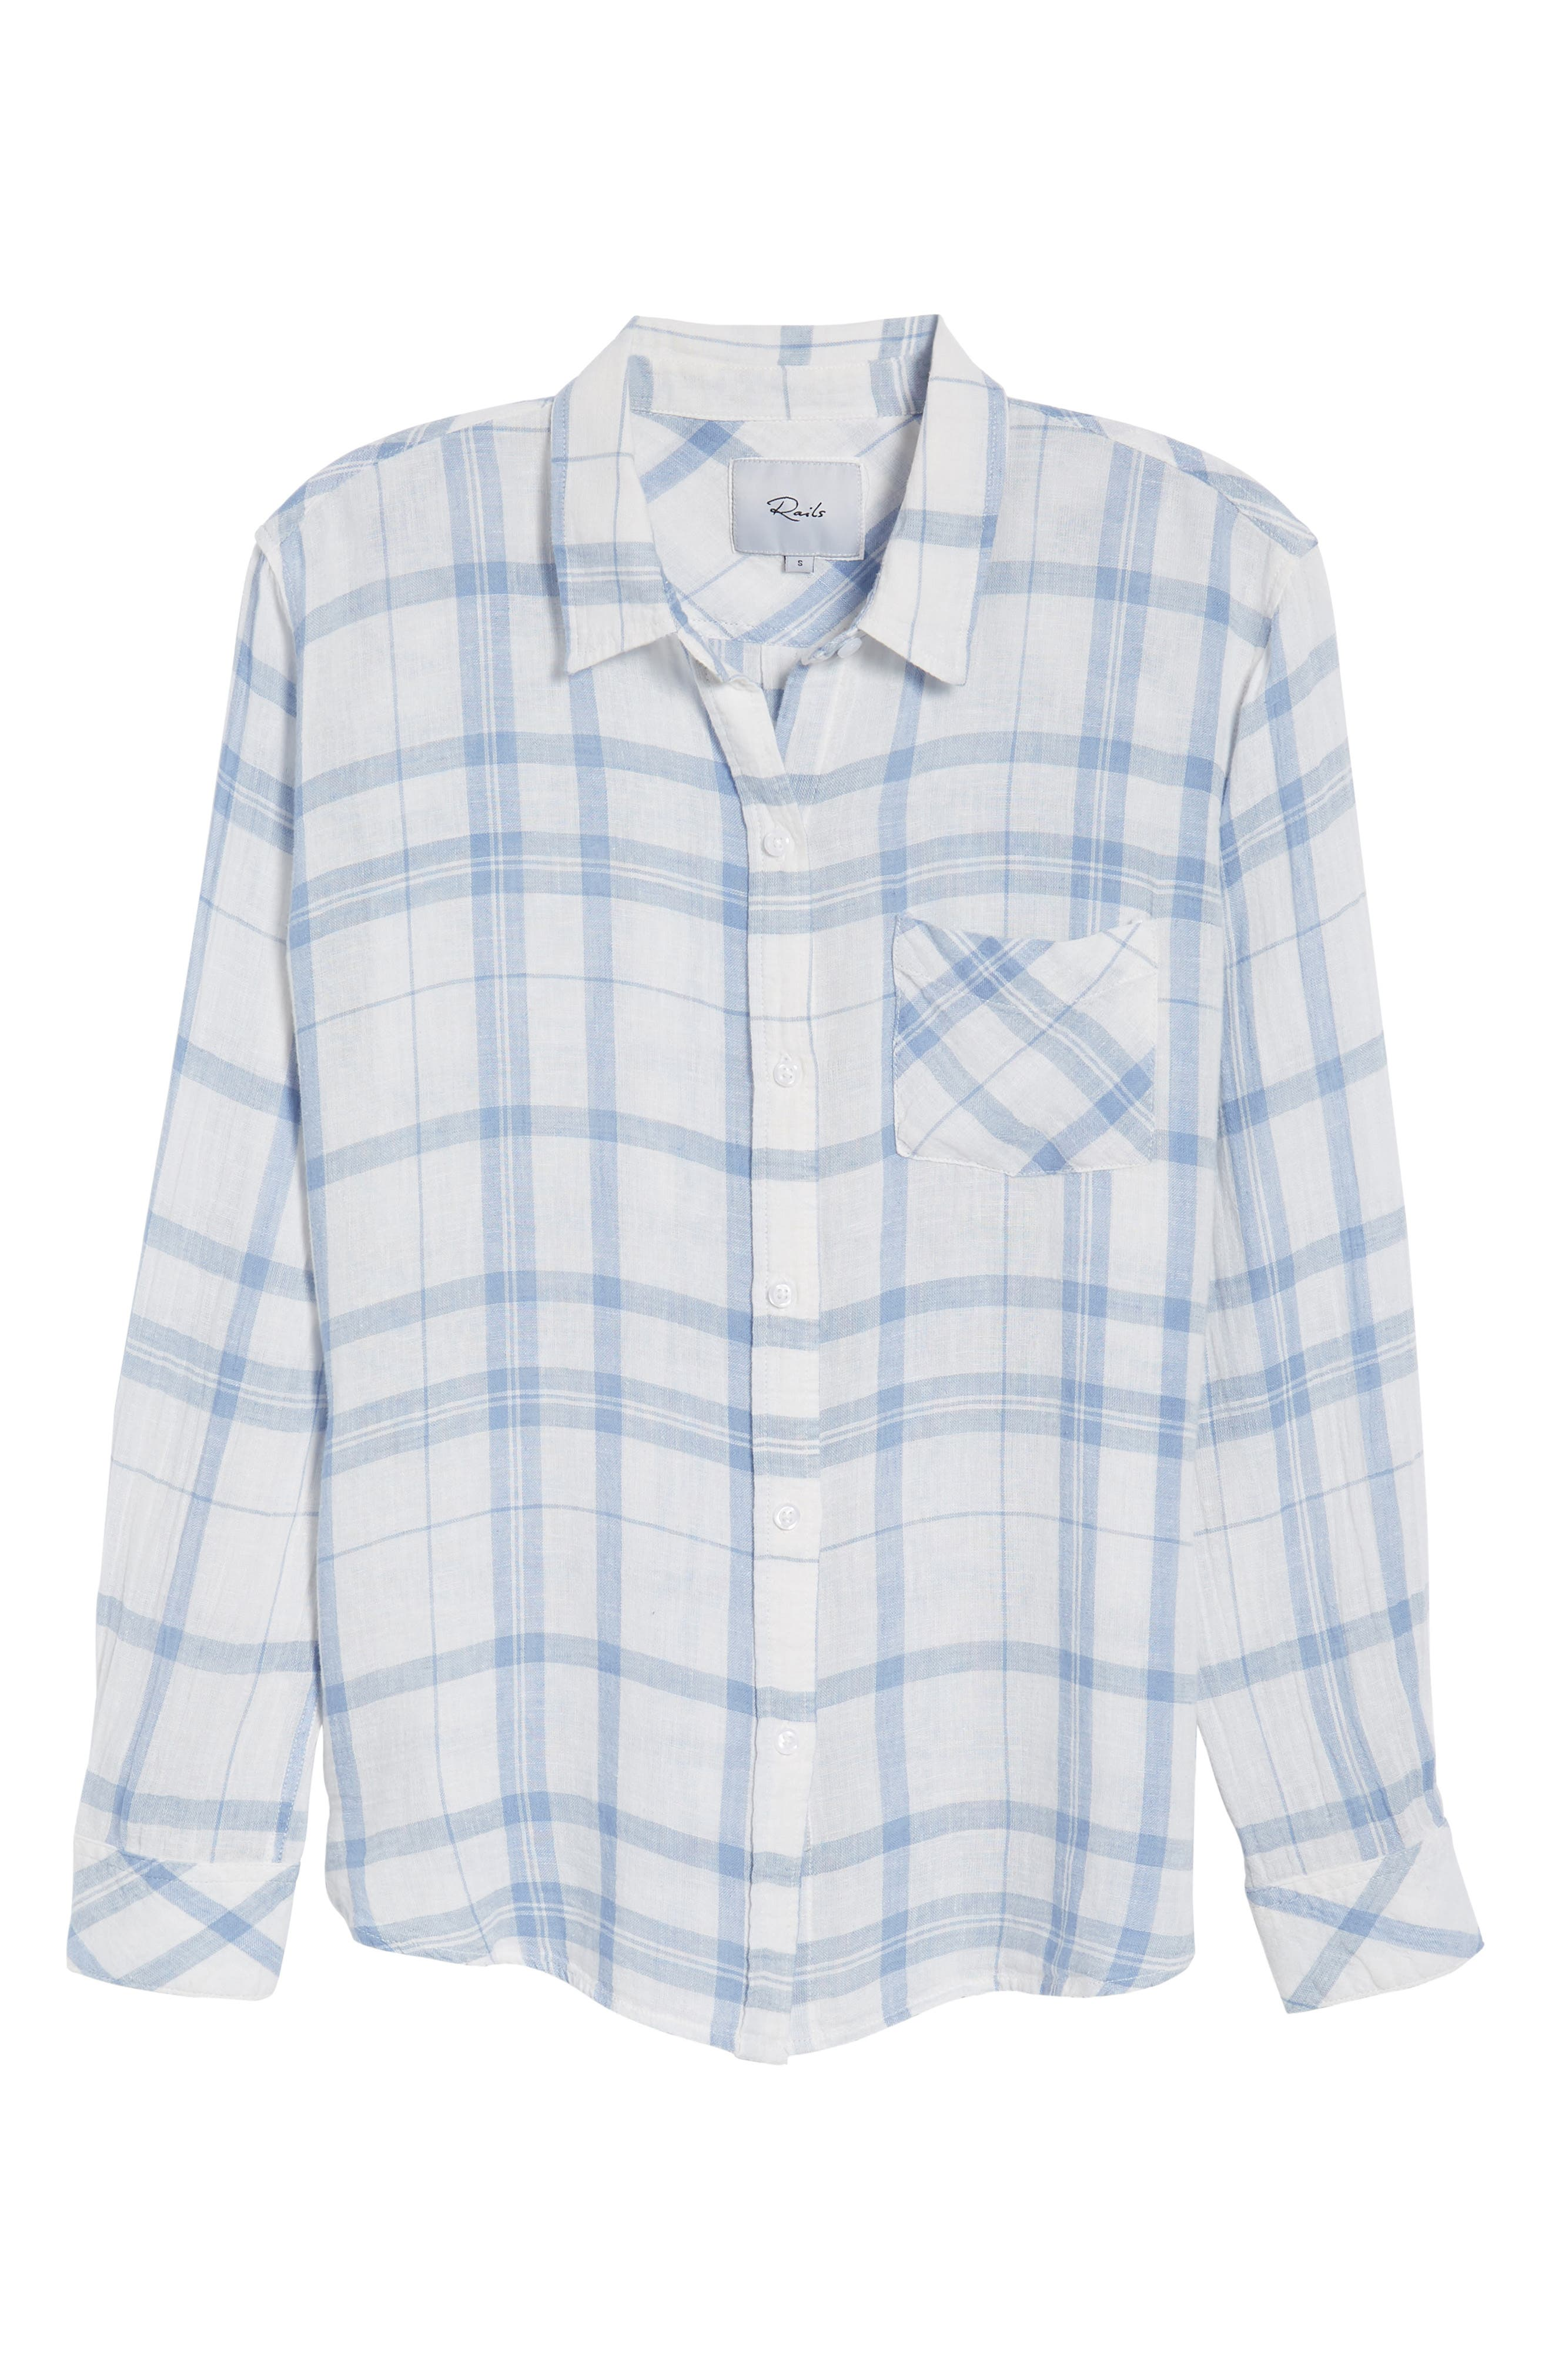 Charli Shirt,                             Alternate thumbnail 7, color,                             TRUE BLUE WHITE